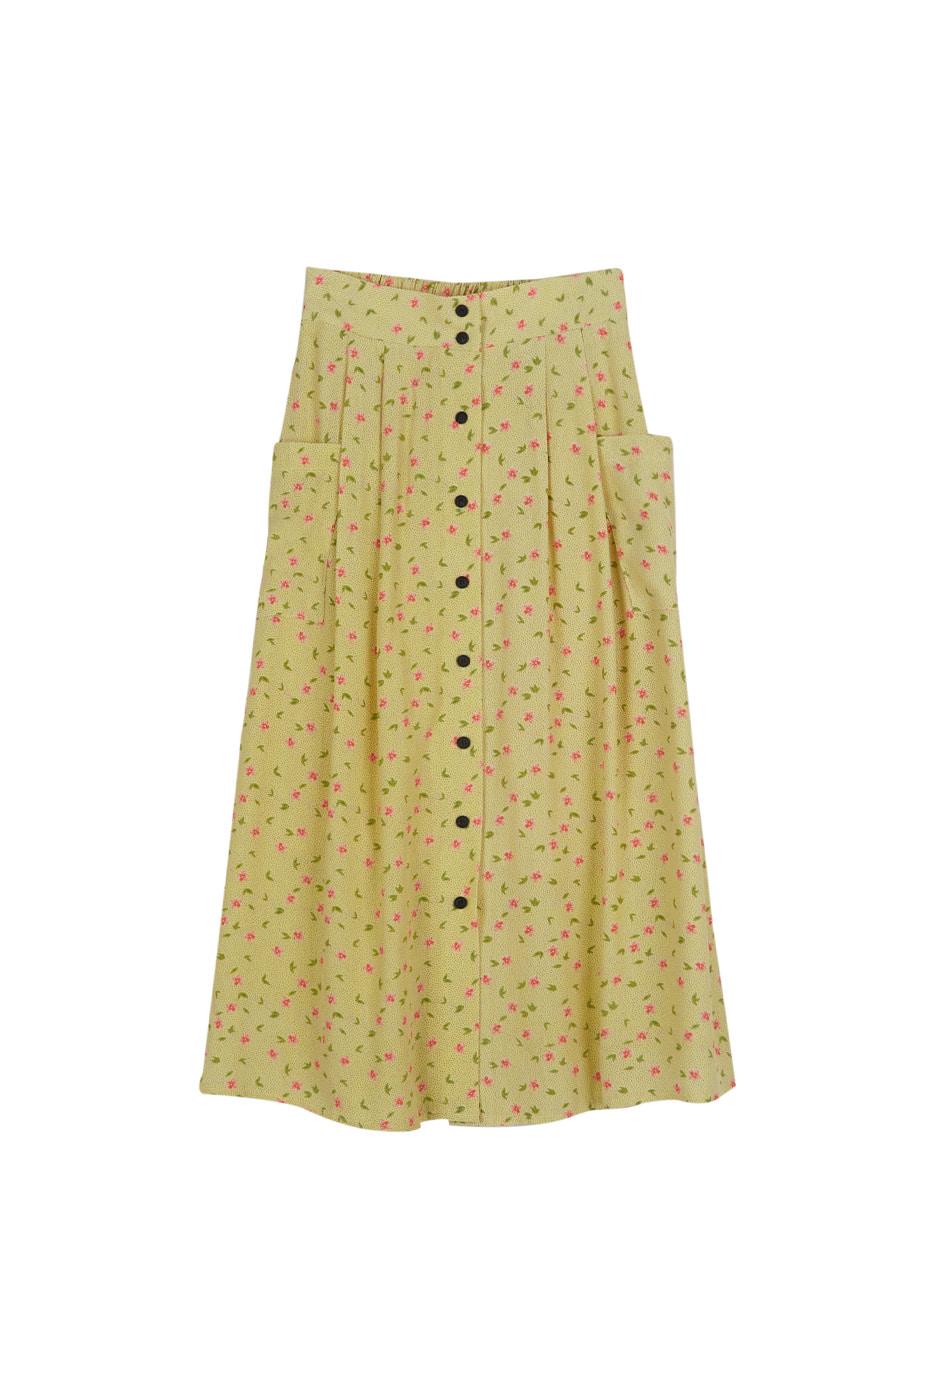 Lara floral button midi skirt